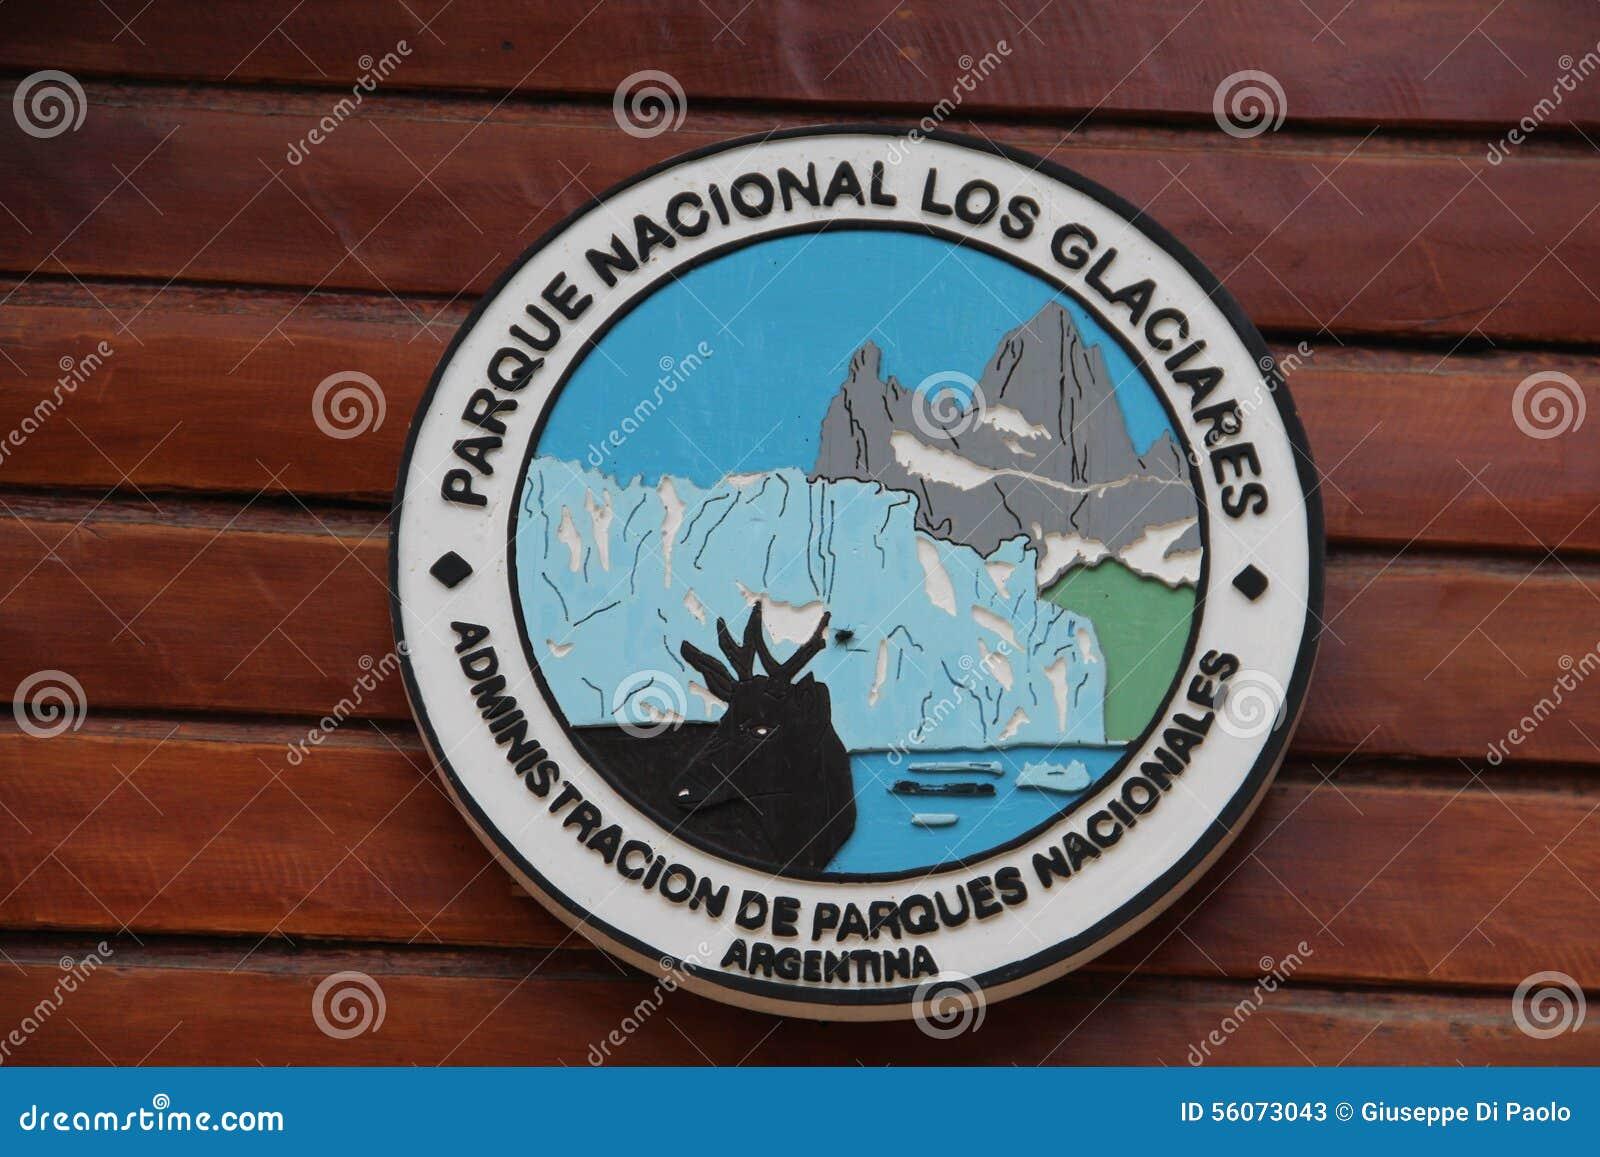 Patagonia Los Glaciares Np Editorial Stock Photo Illustration